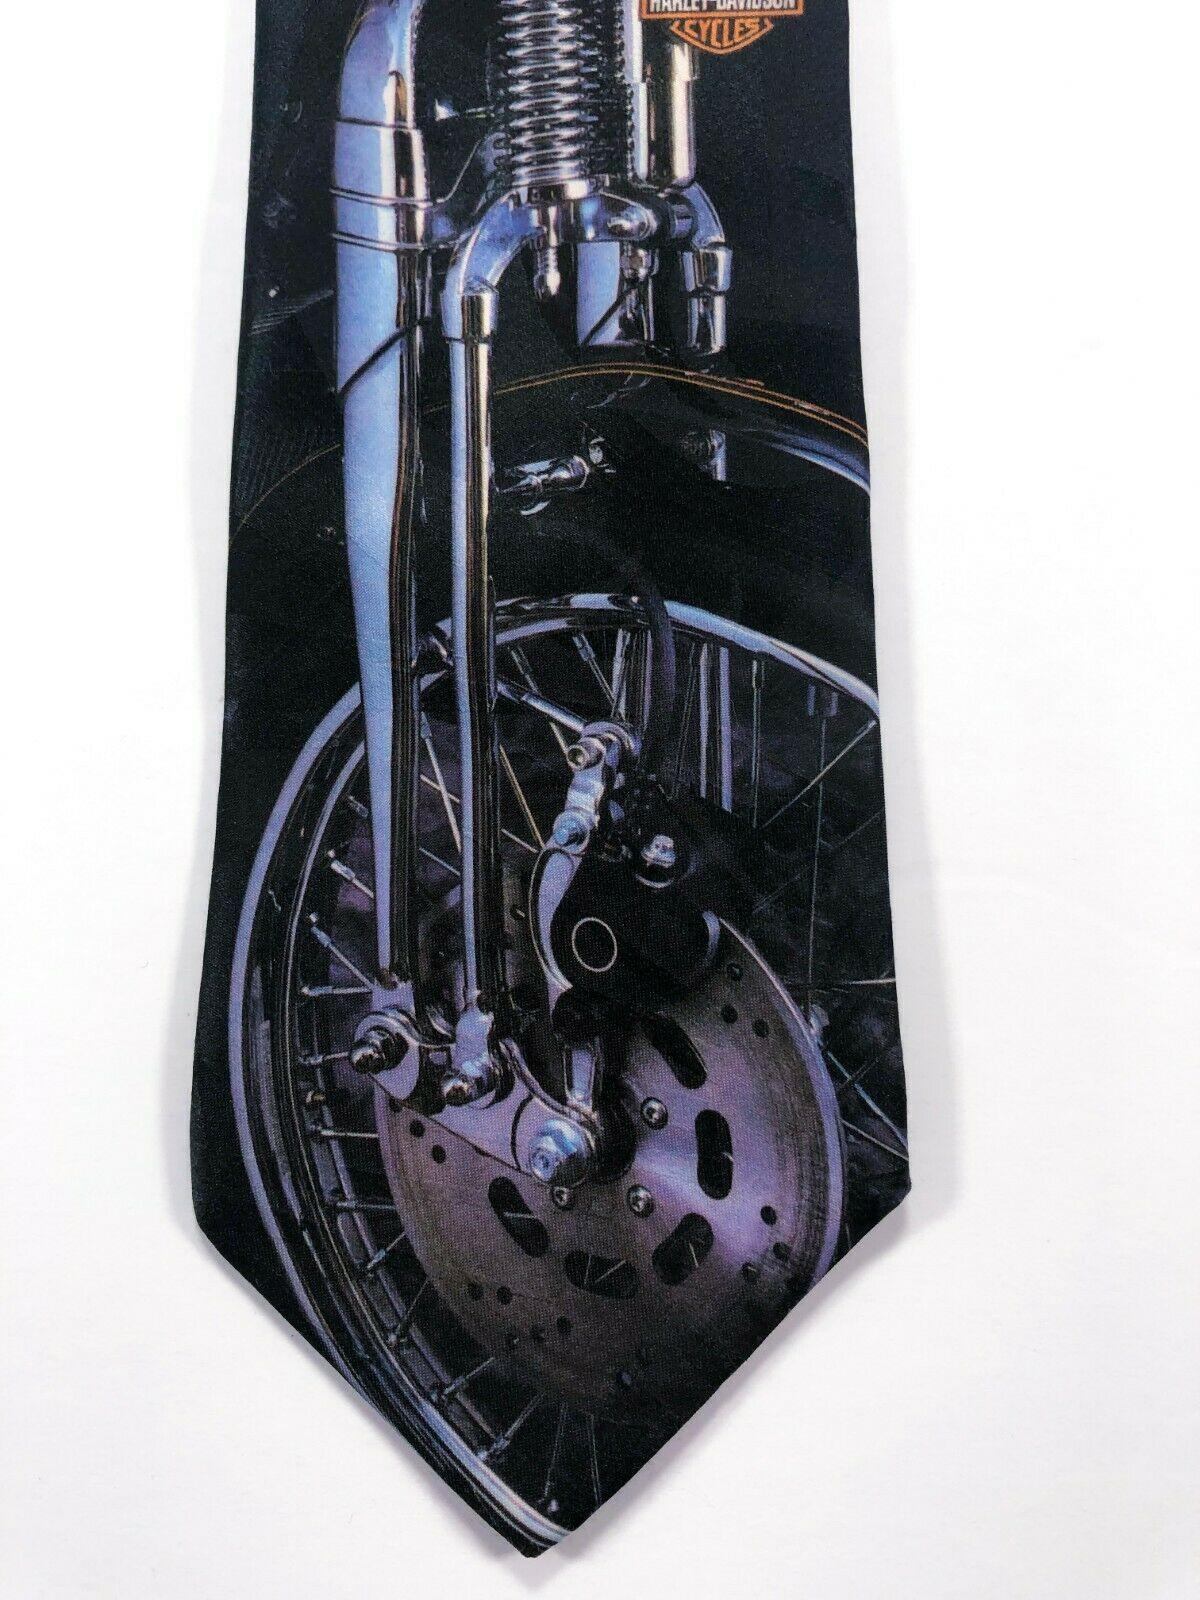 Harley Davidson Neck Tie Chrome Motorcycle The Leading Edge Ralph Marlin image 2